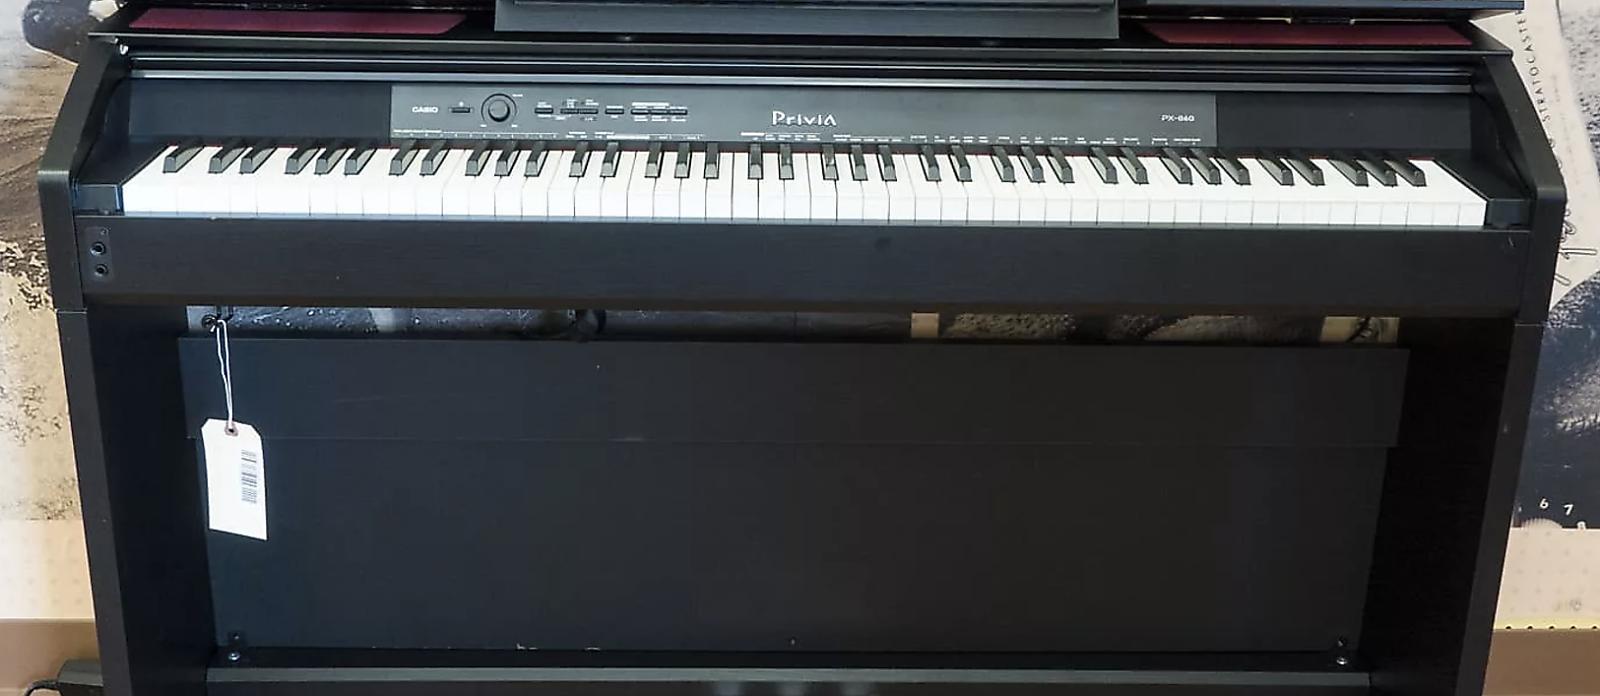 casio privia px 860 digital console piano reverb. Black Bedroom Furniture Sets. Home Design Ideas